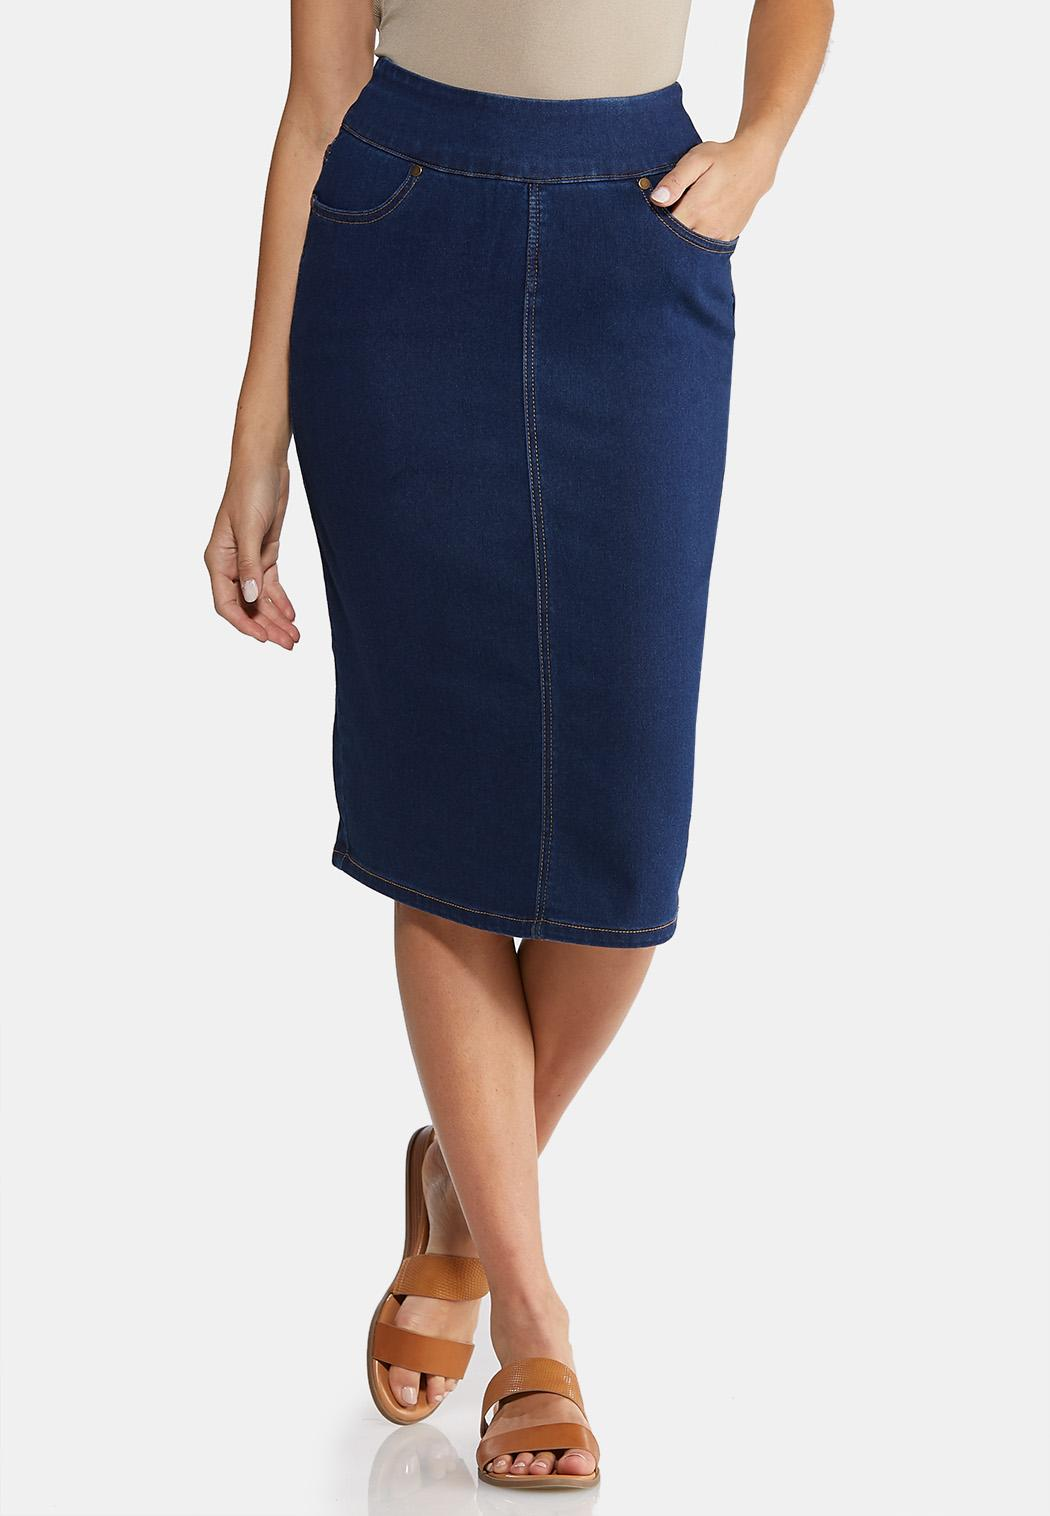 52ca68b35 Women's Plus Size Skirts